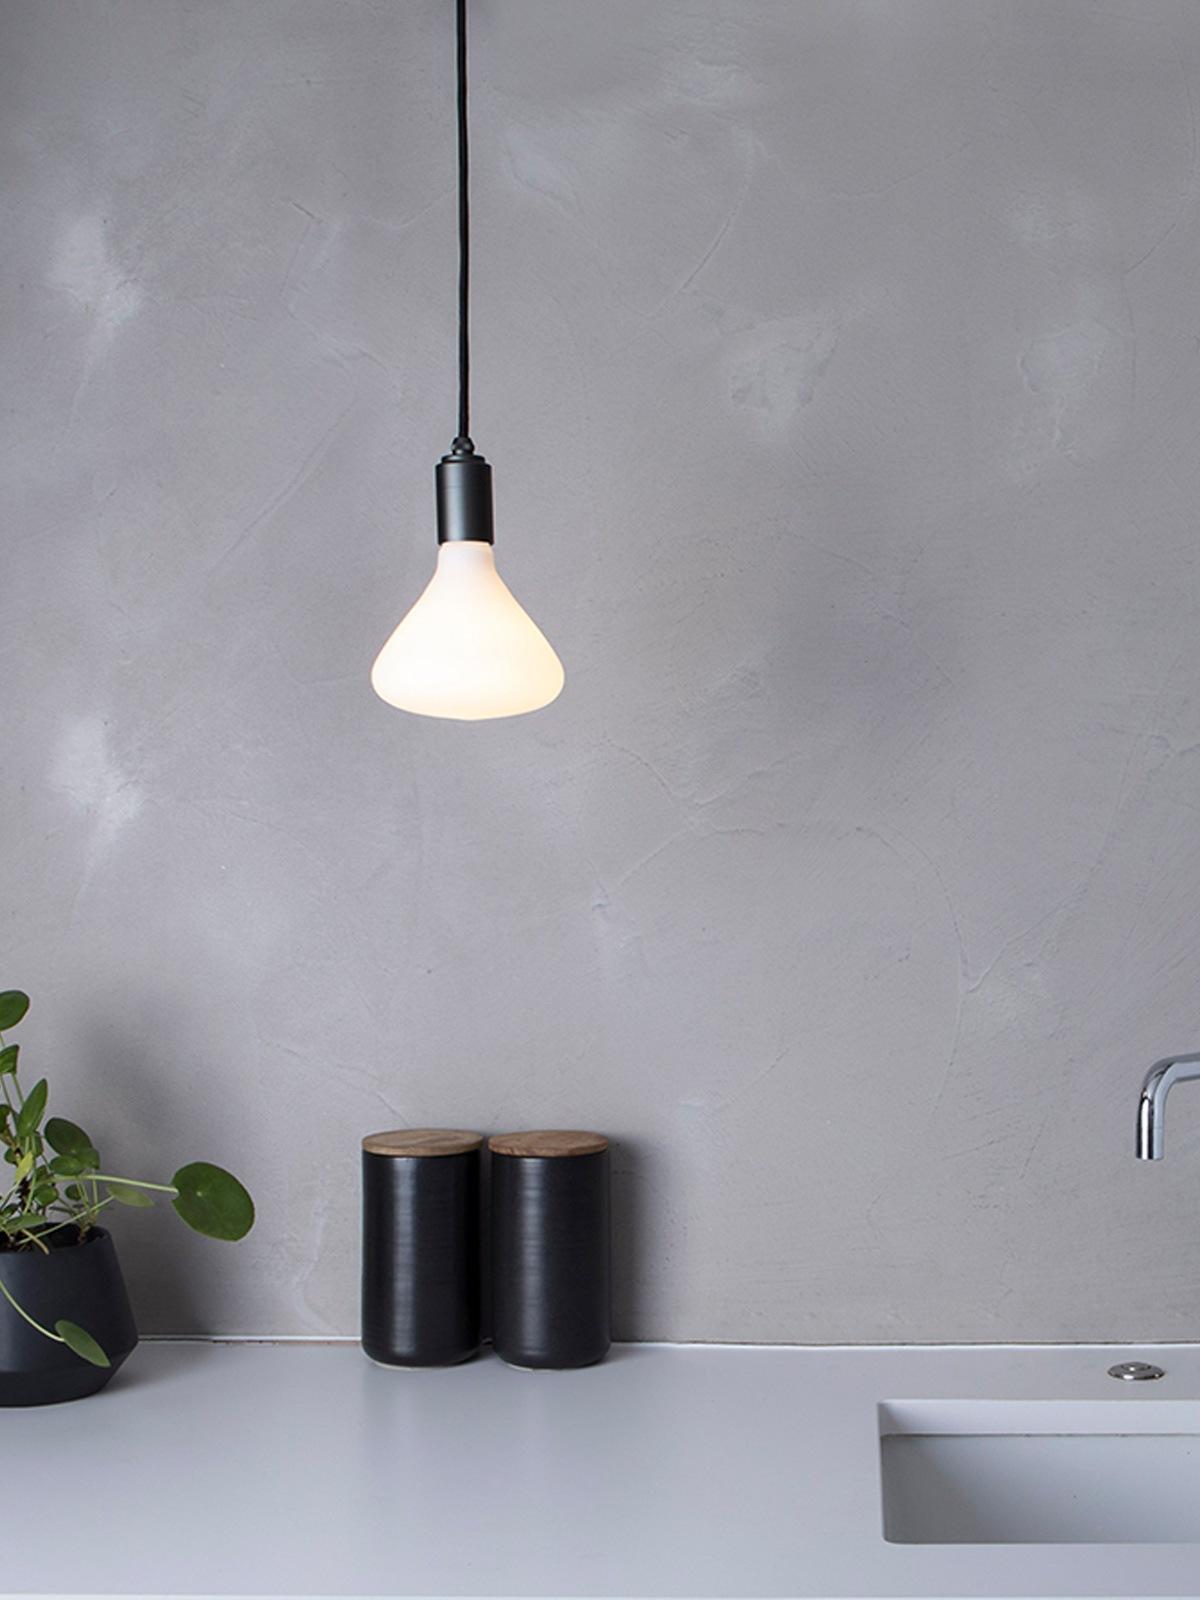 Pendant Light Graphit Noma Birne DesignOrt Lampen Berlin